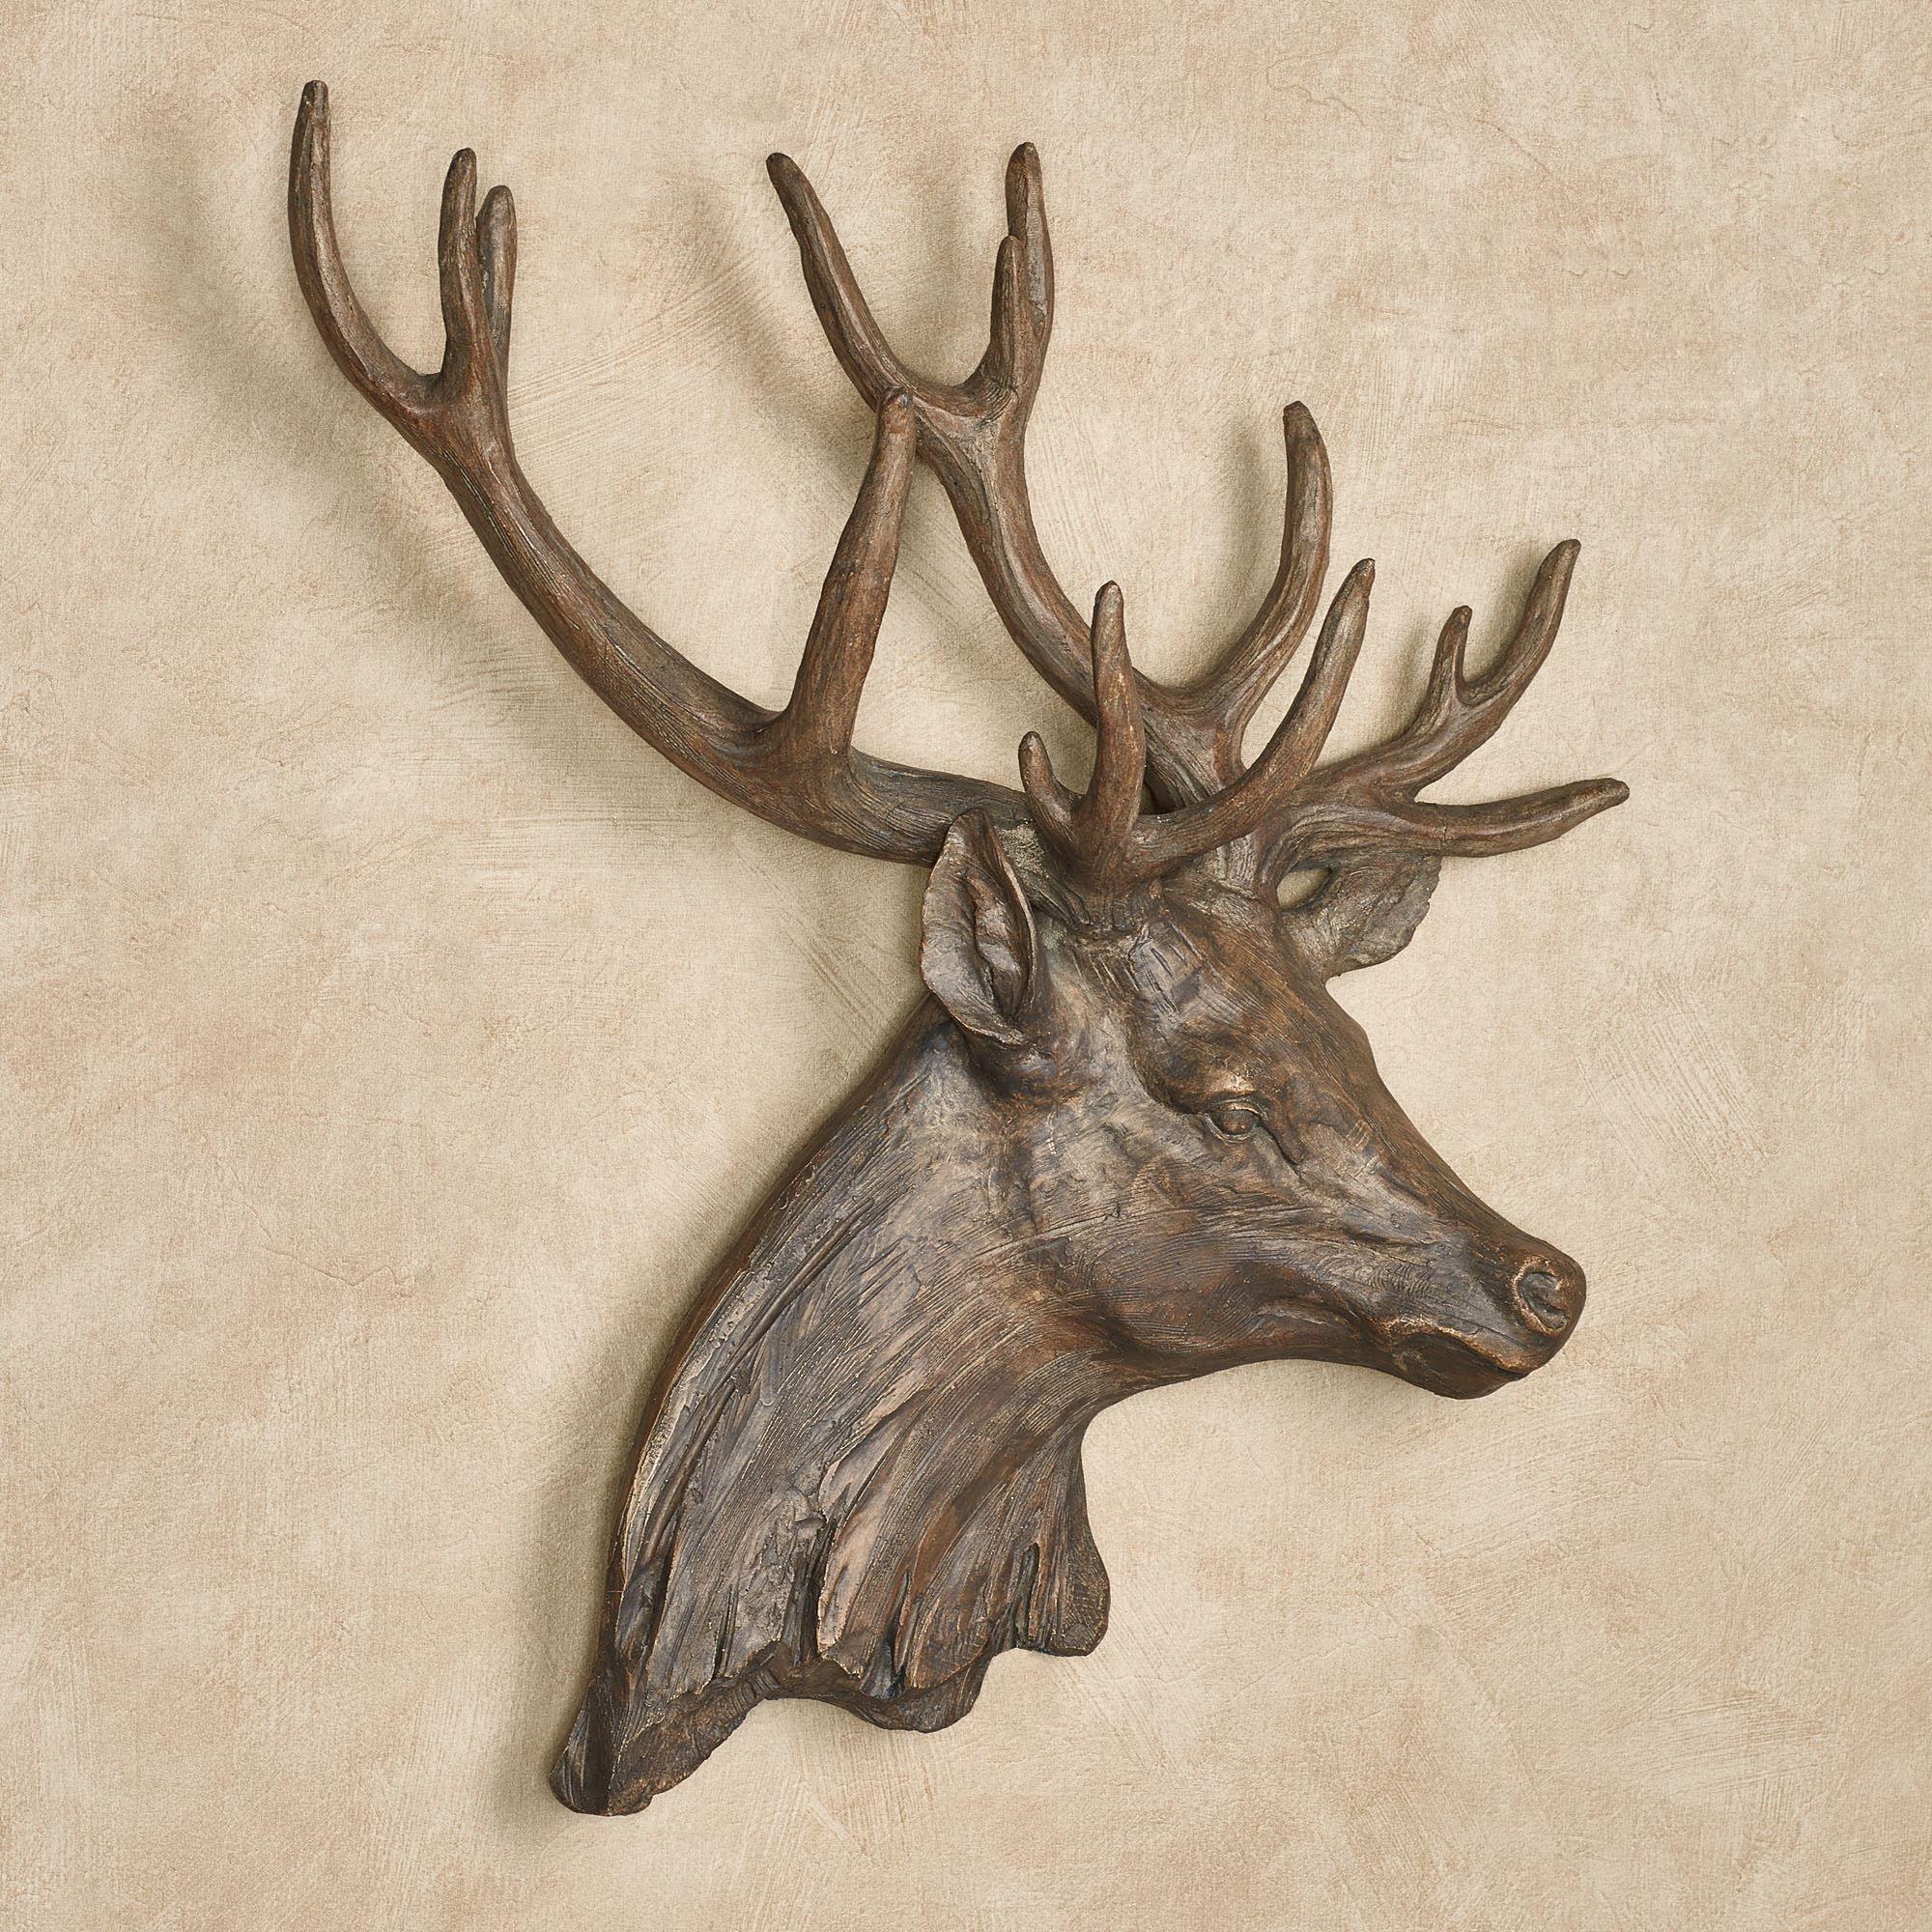 incredible Deer Head Wall Art Part - 16: Deer Head Stag Wall Art Brown. Touch to zoom